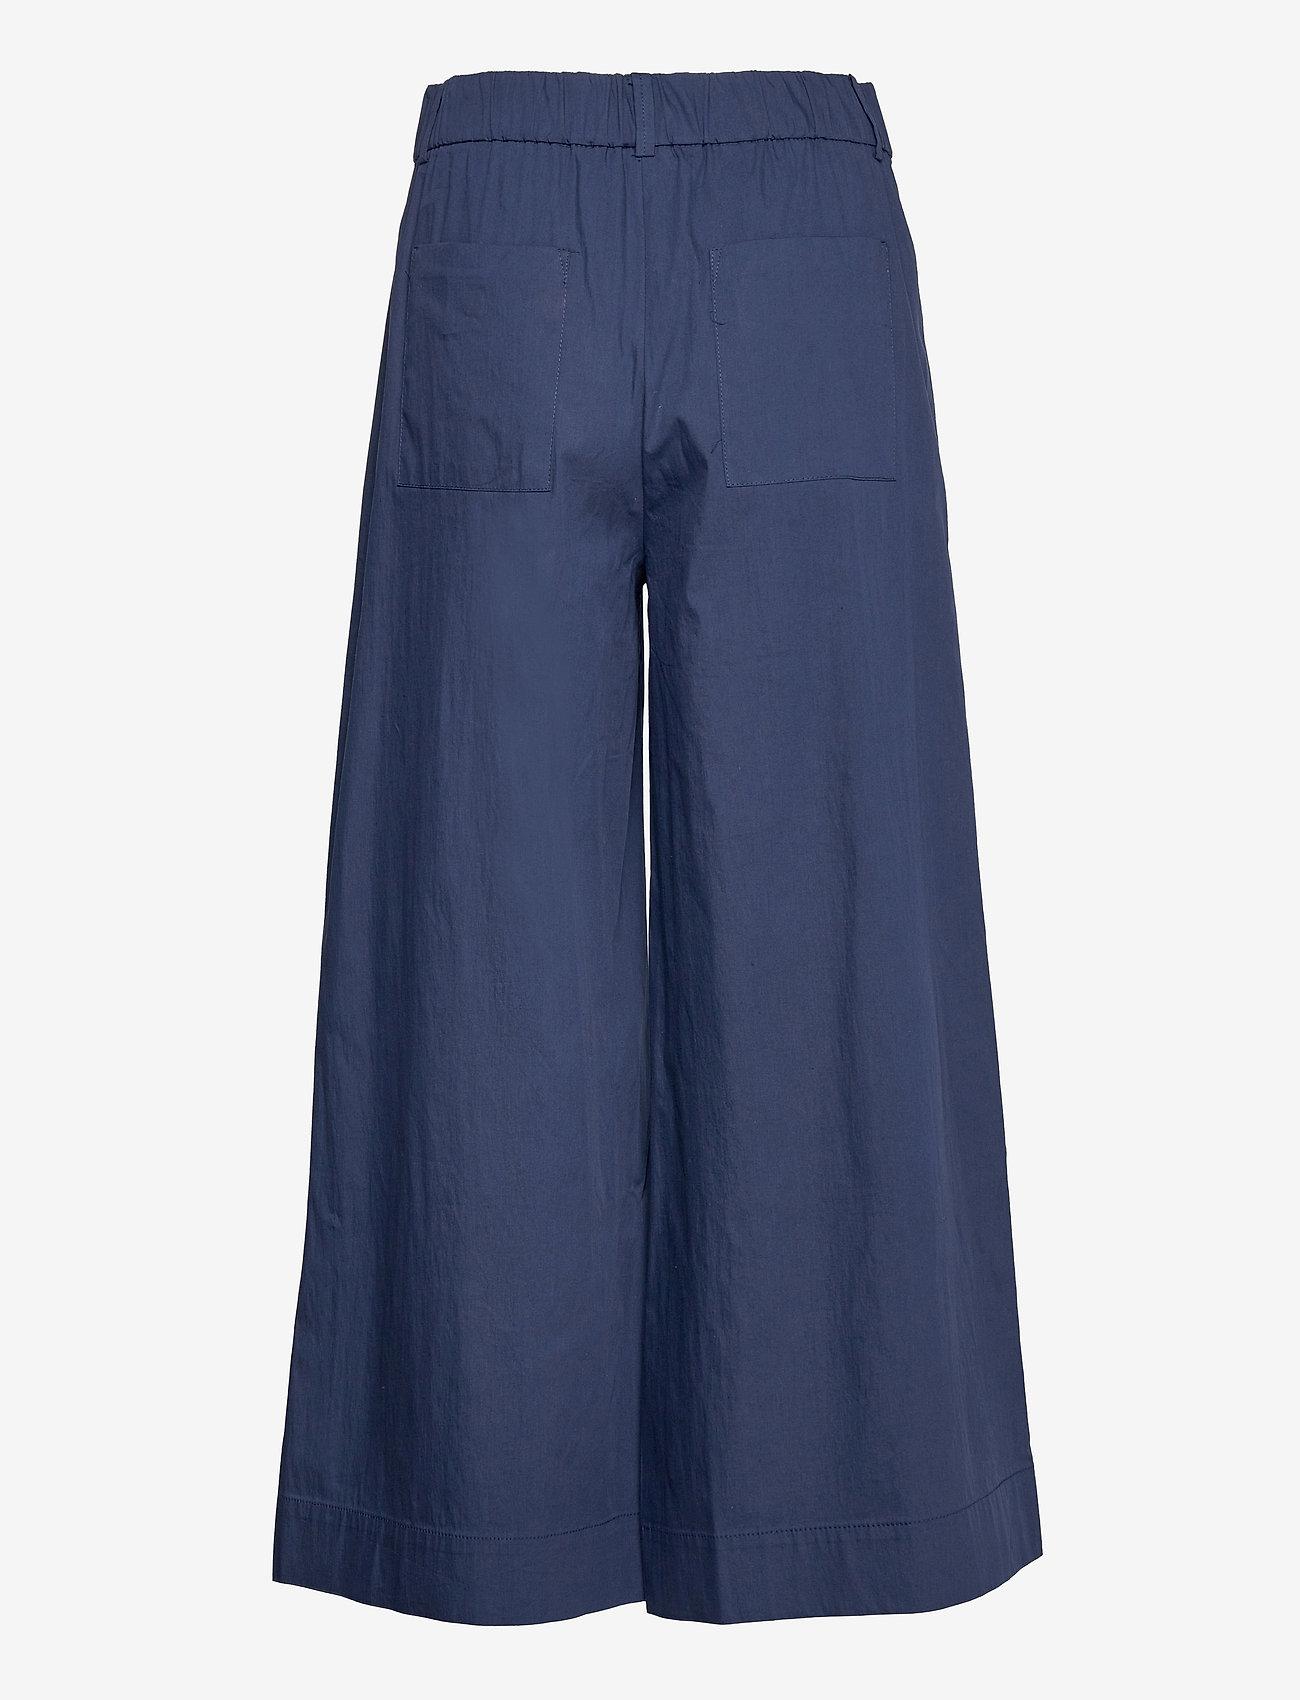 Mango - CIEL - bukser med brede ben - navy - 1